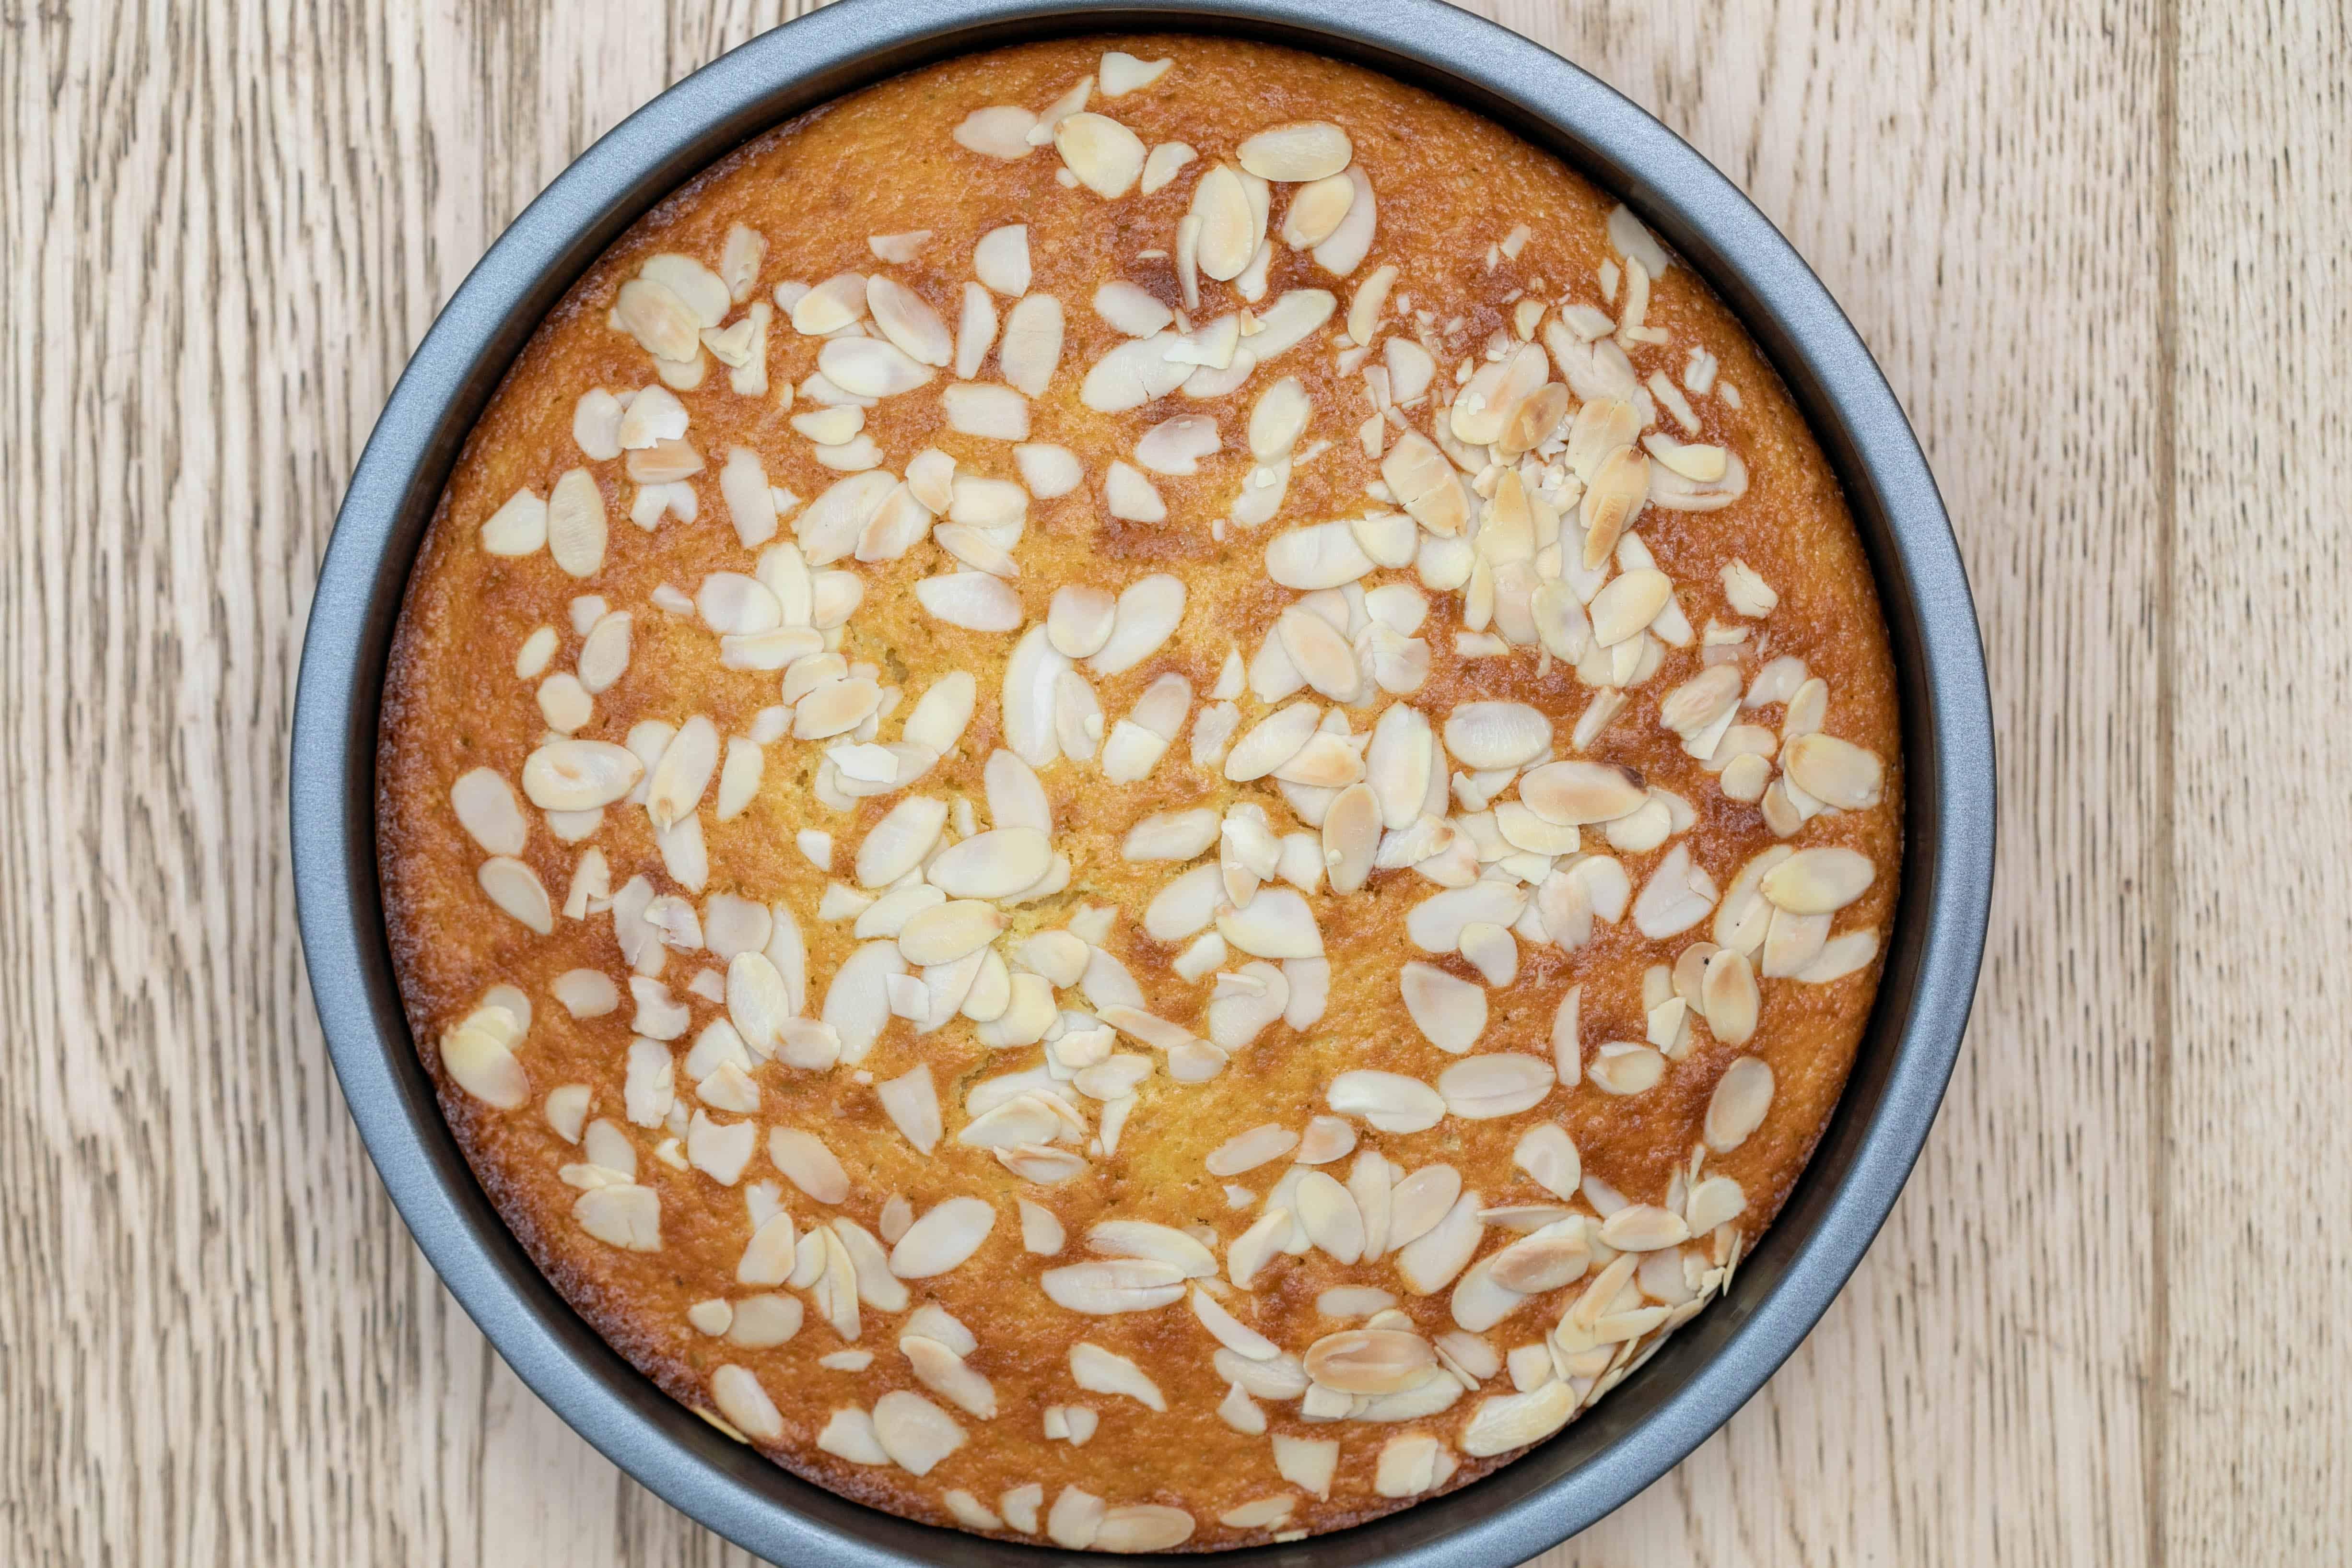 baked french yogurt cake with almonds